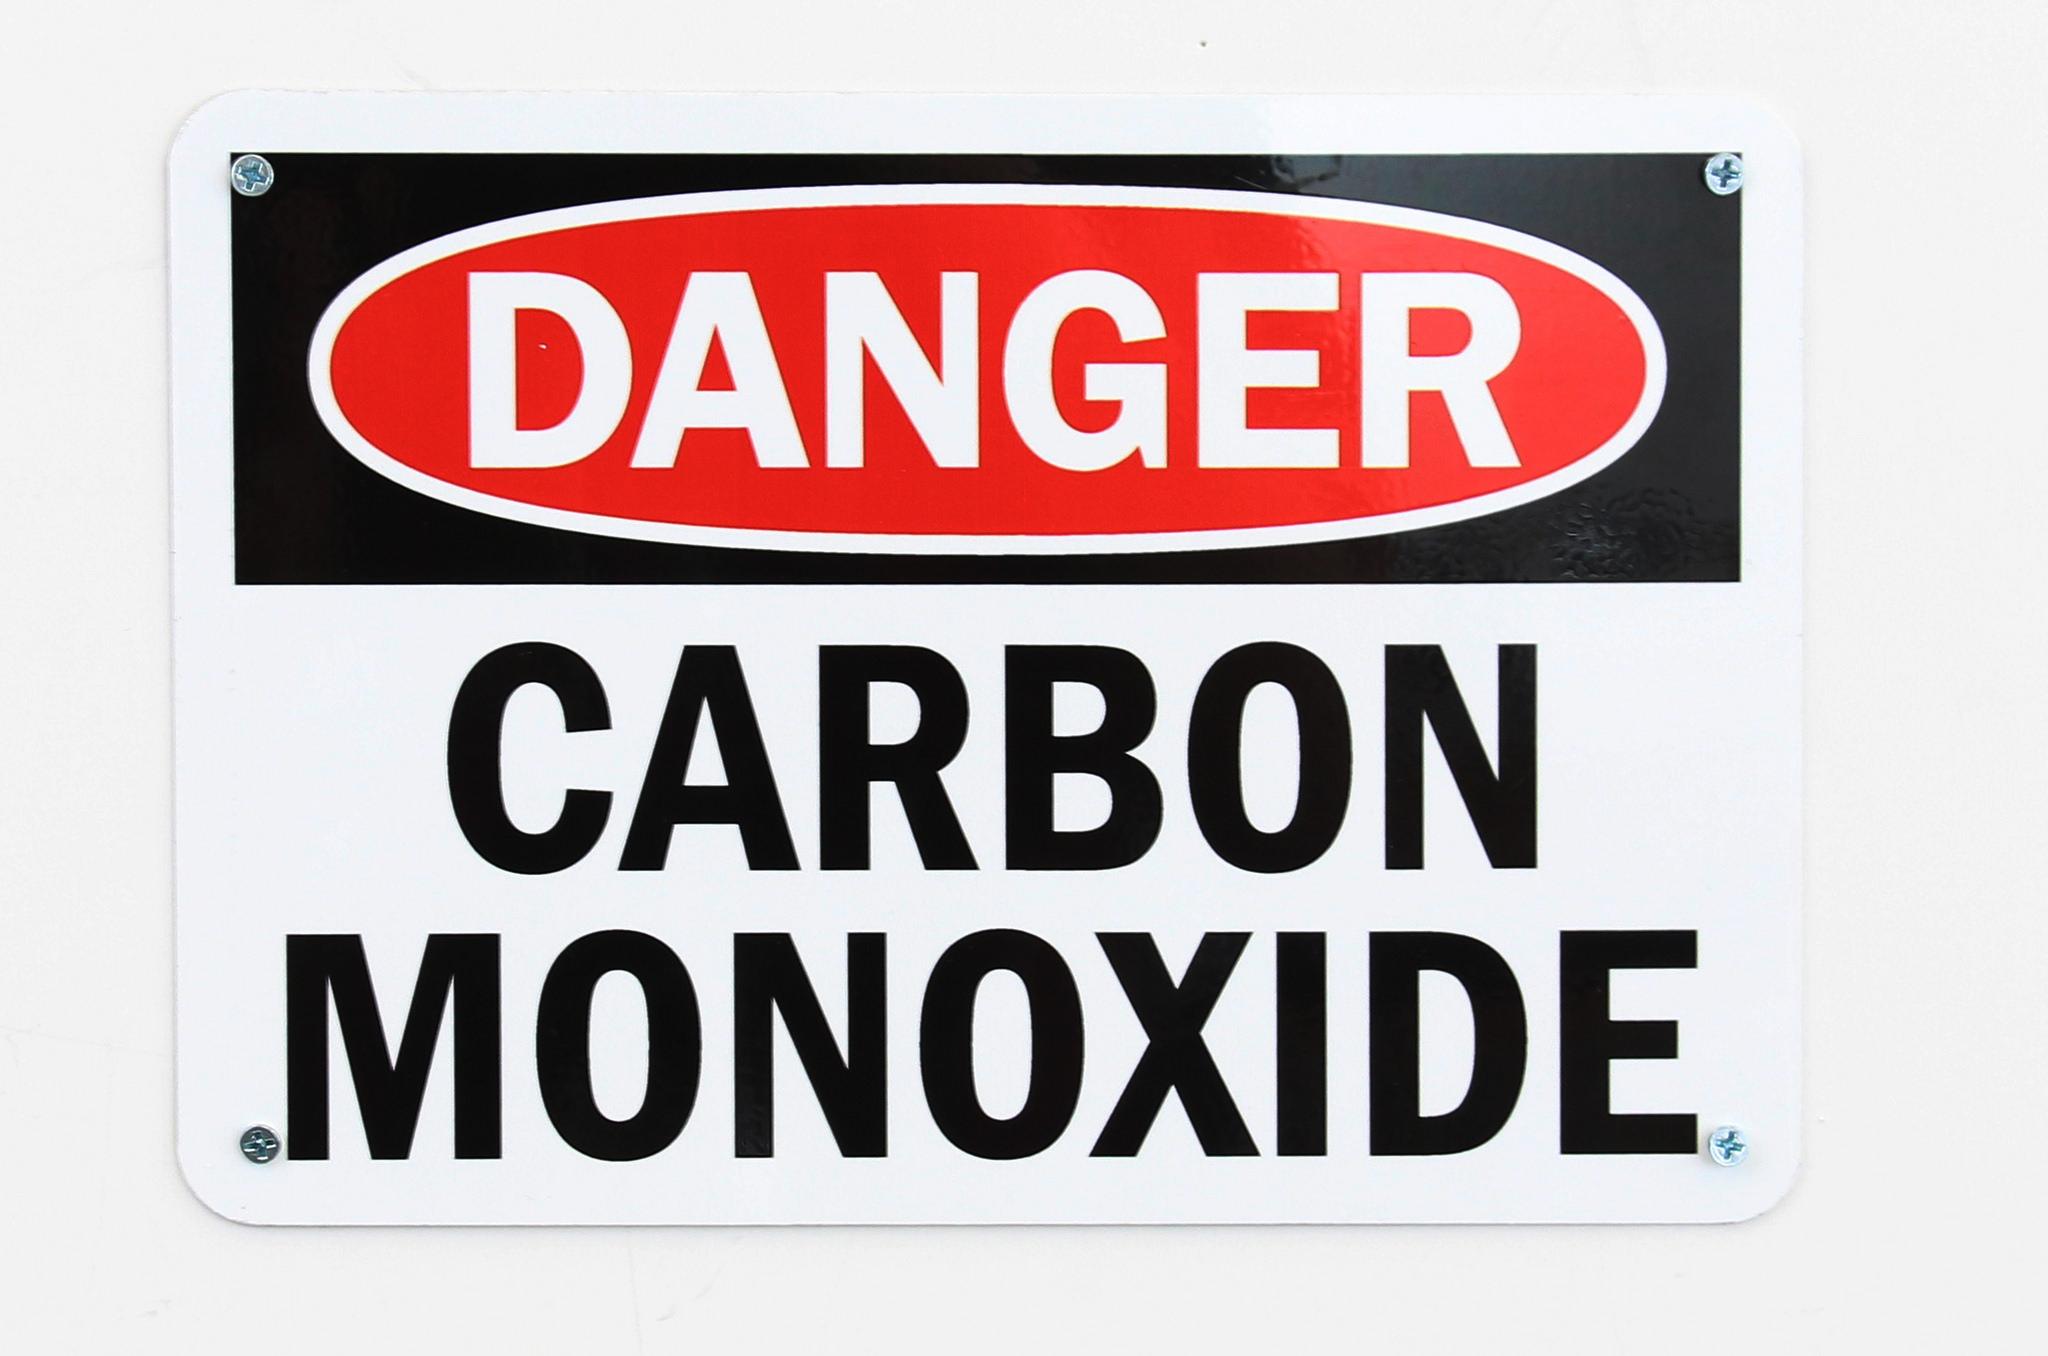 5 Carbon Monoxide Safety Tips